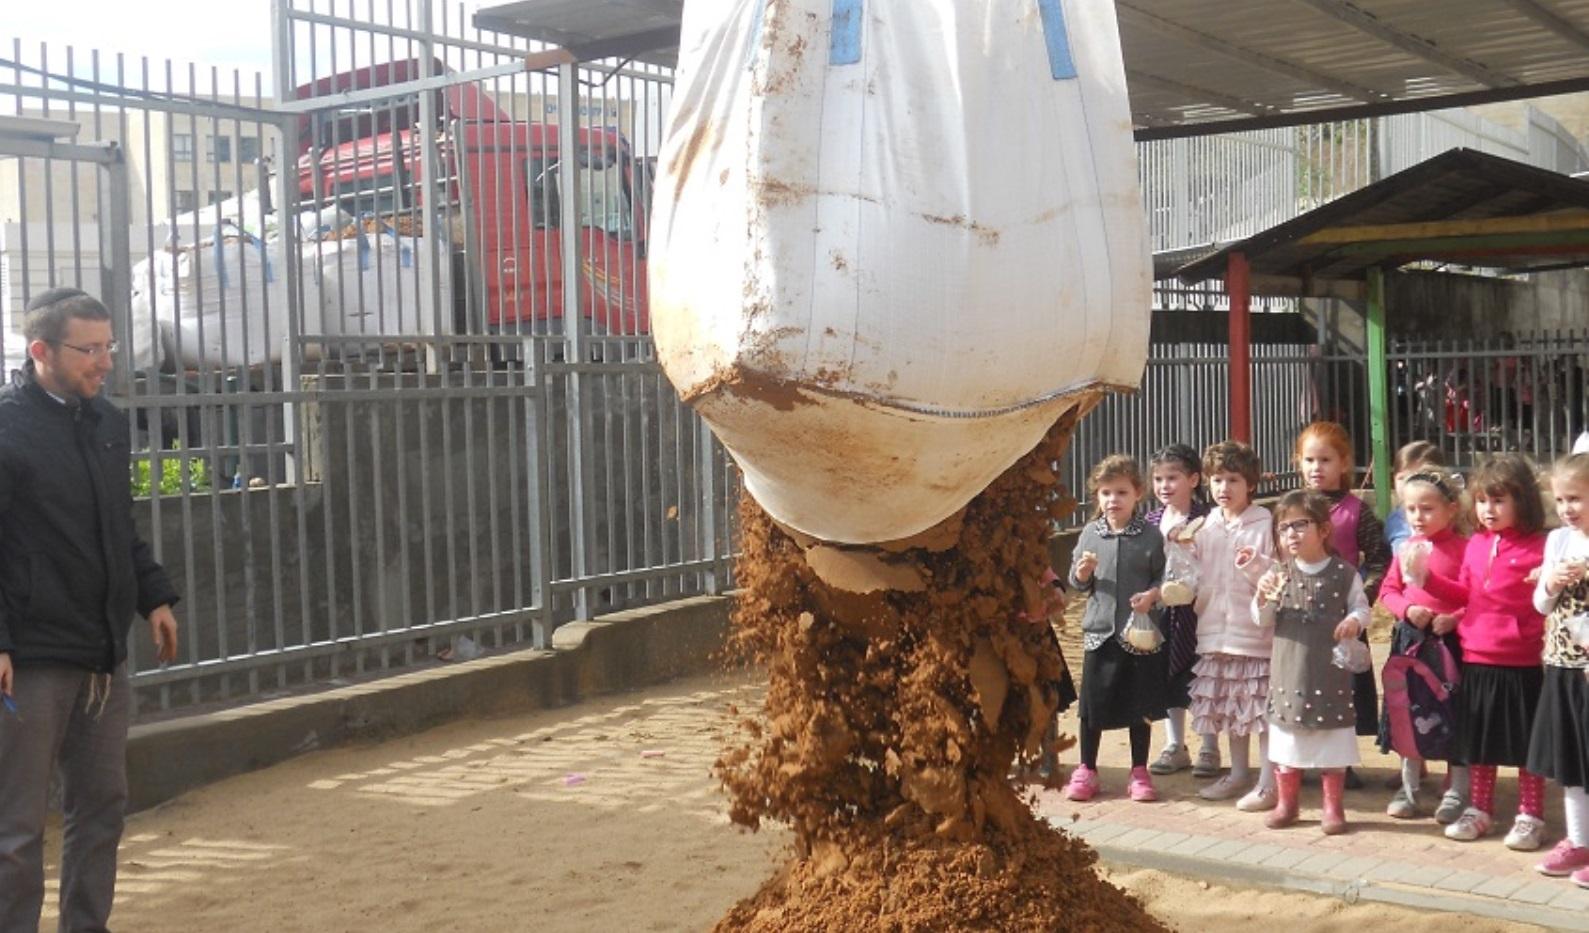 Leshomra's founder Avishai Himelfarb supervising a delivery of soil to a Modi'in Illit kindergarten. Photo: courtesy